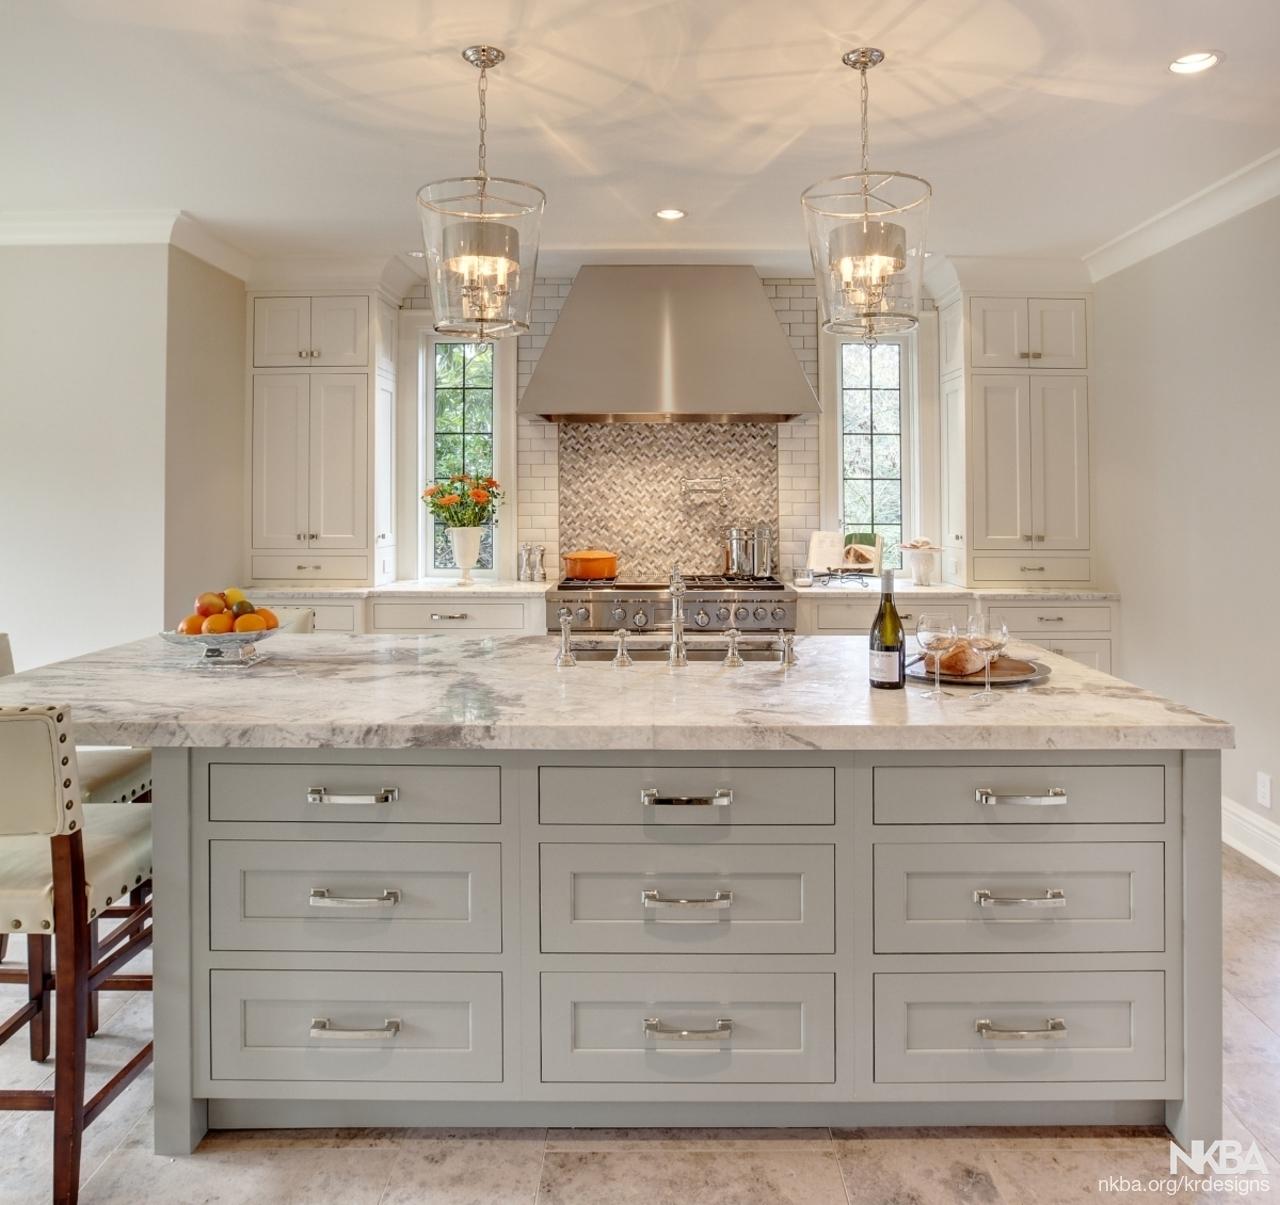 Kitchen Island - the new kitchen jewel by Karin Ross Designs - NKBA